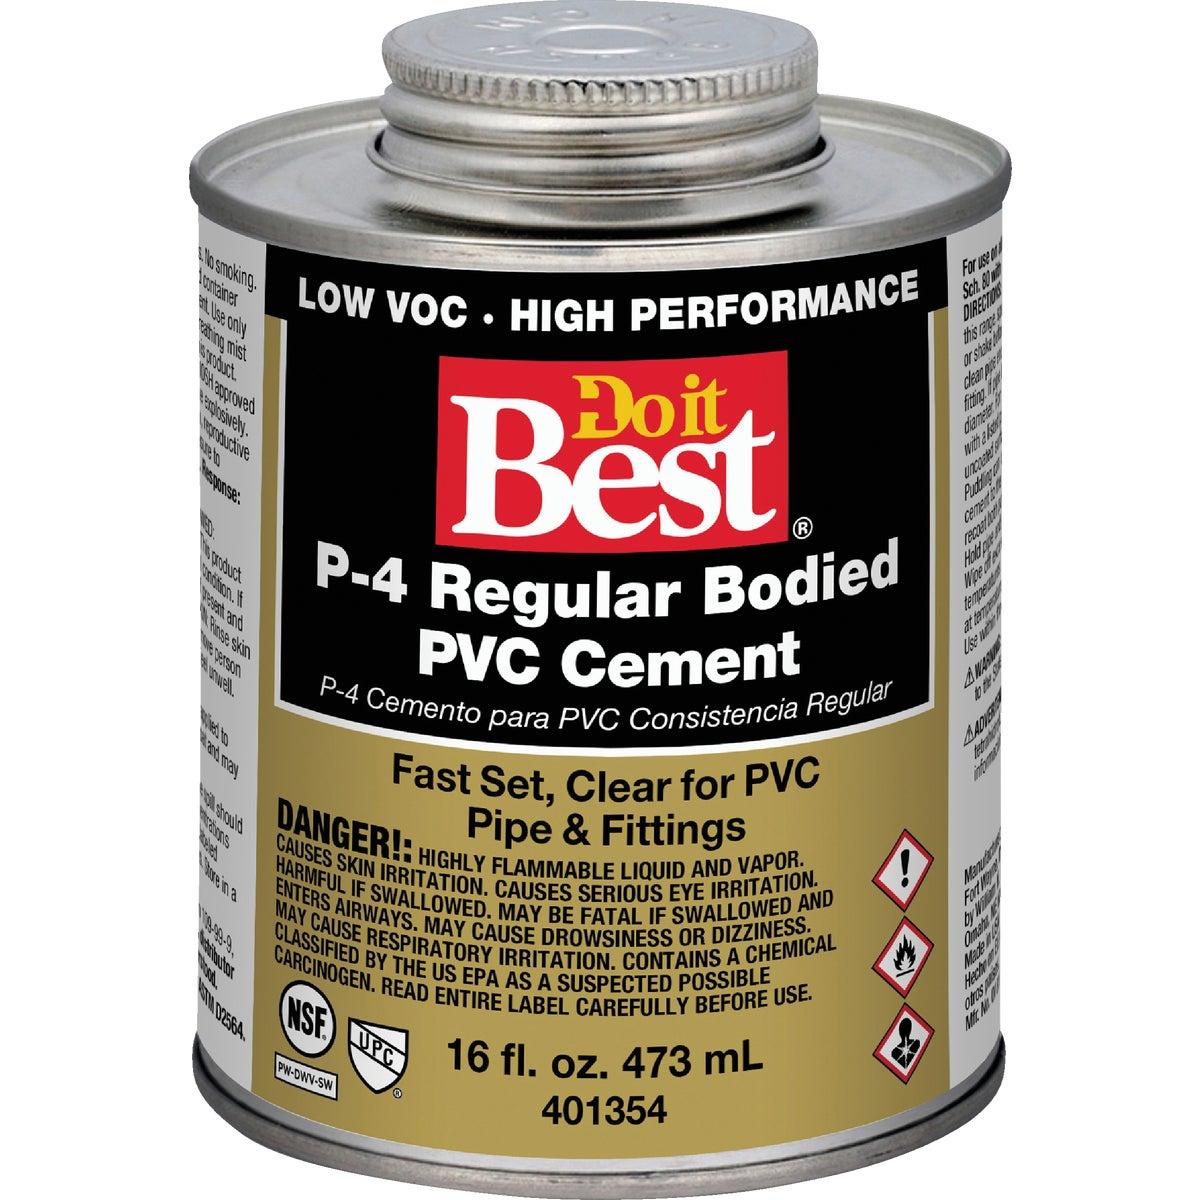 PINT PVC CEMENT - 018129 by Wm H Harvey Co